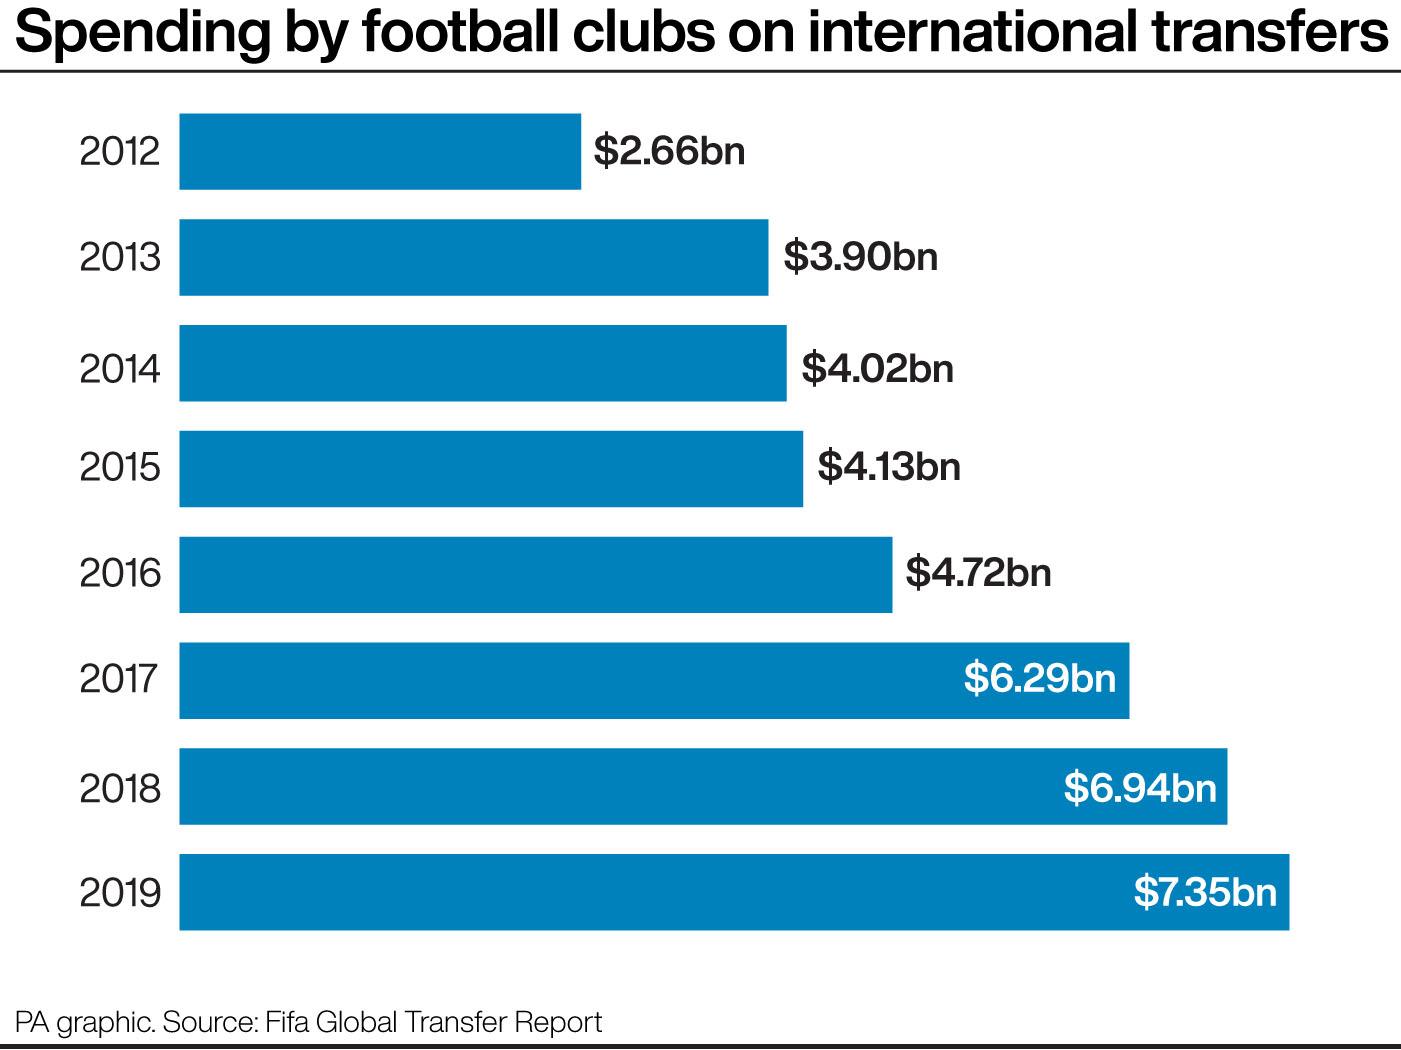 Worldwide spending on international transfers 2012-2019